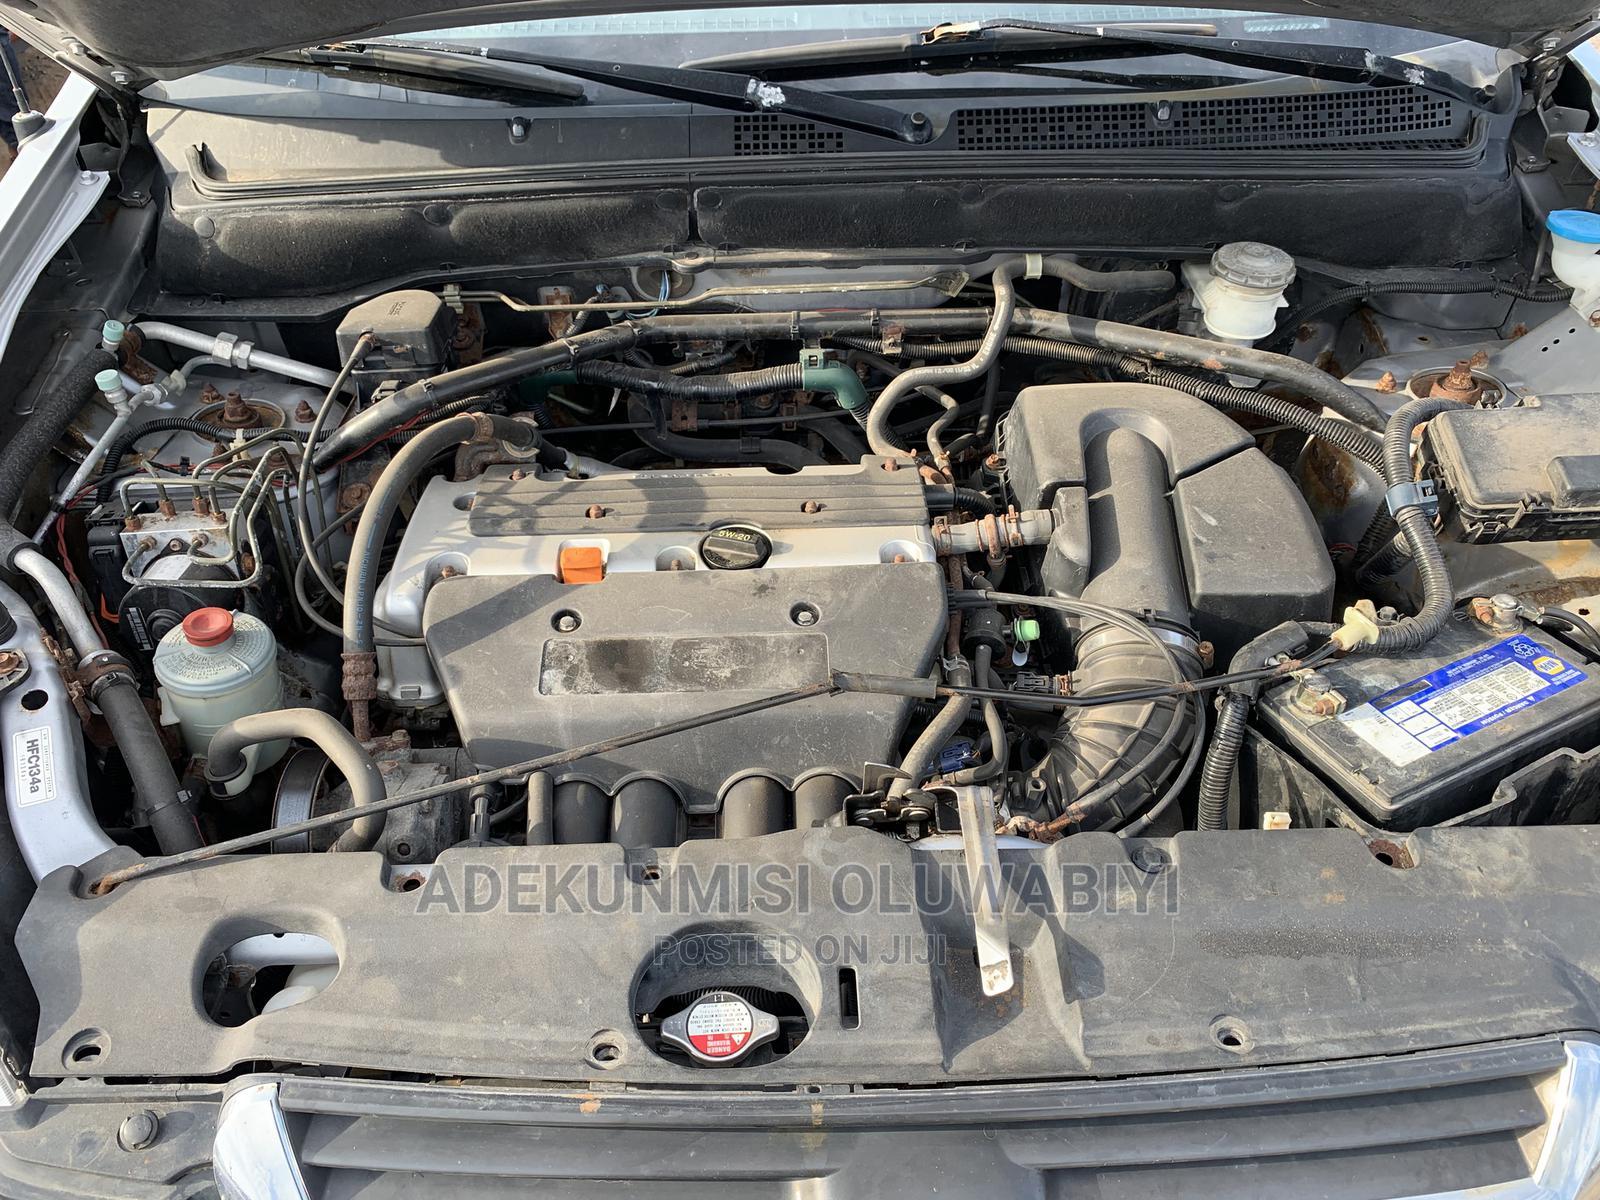 Honda CR-V 2004 EX 4WD Automatic Silver   Cars for sale in Ojodu, Lagos State, Nigeria